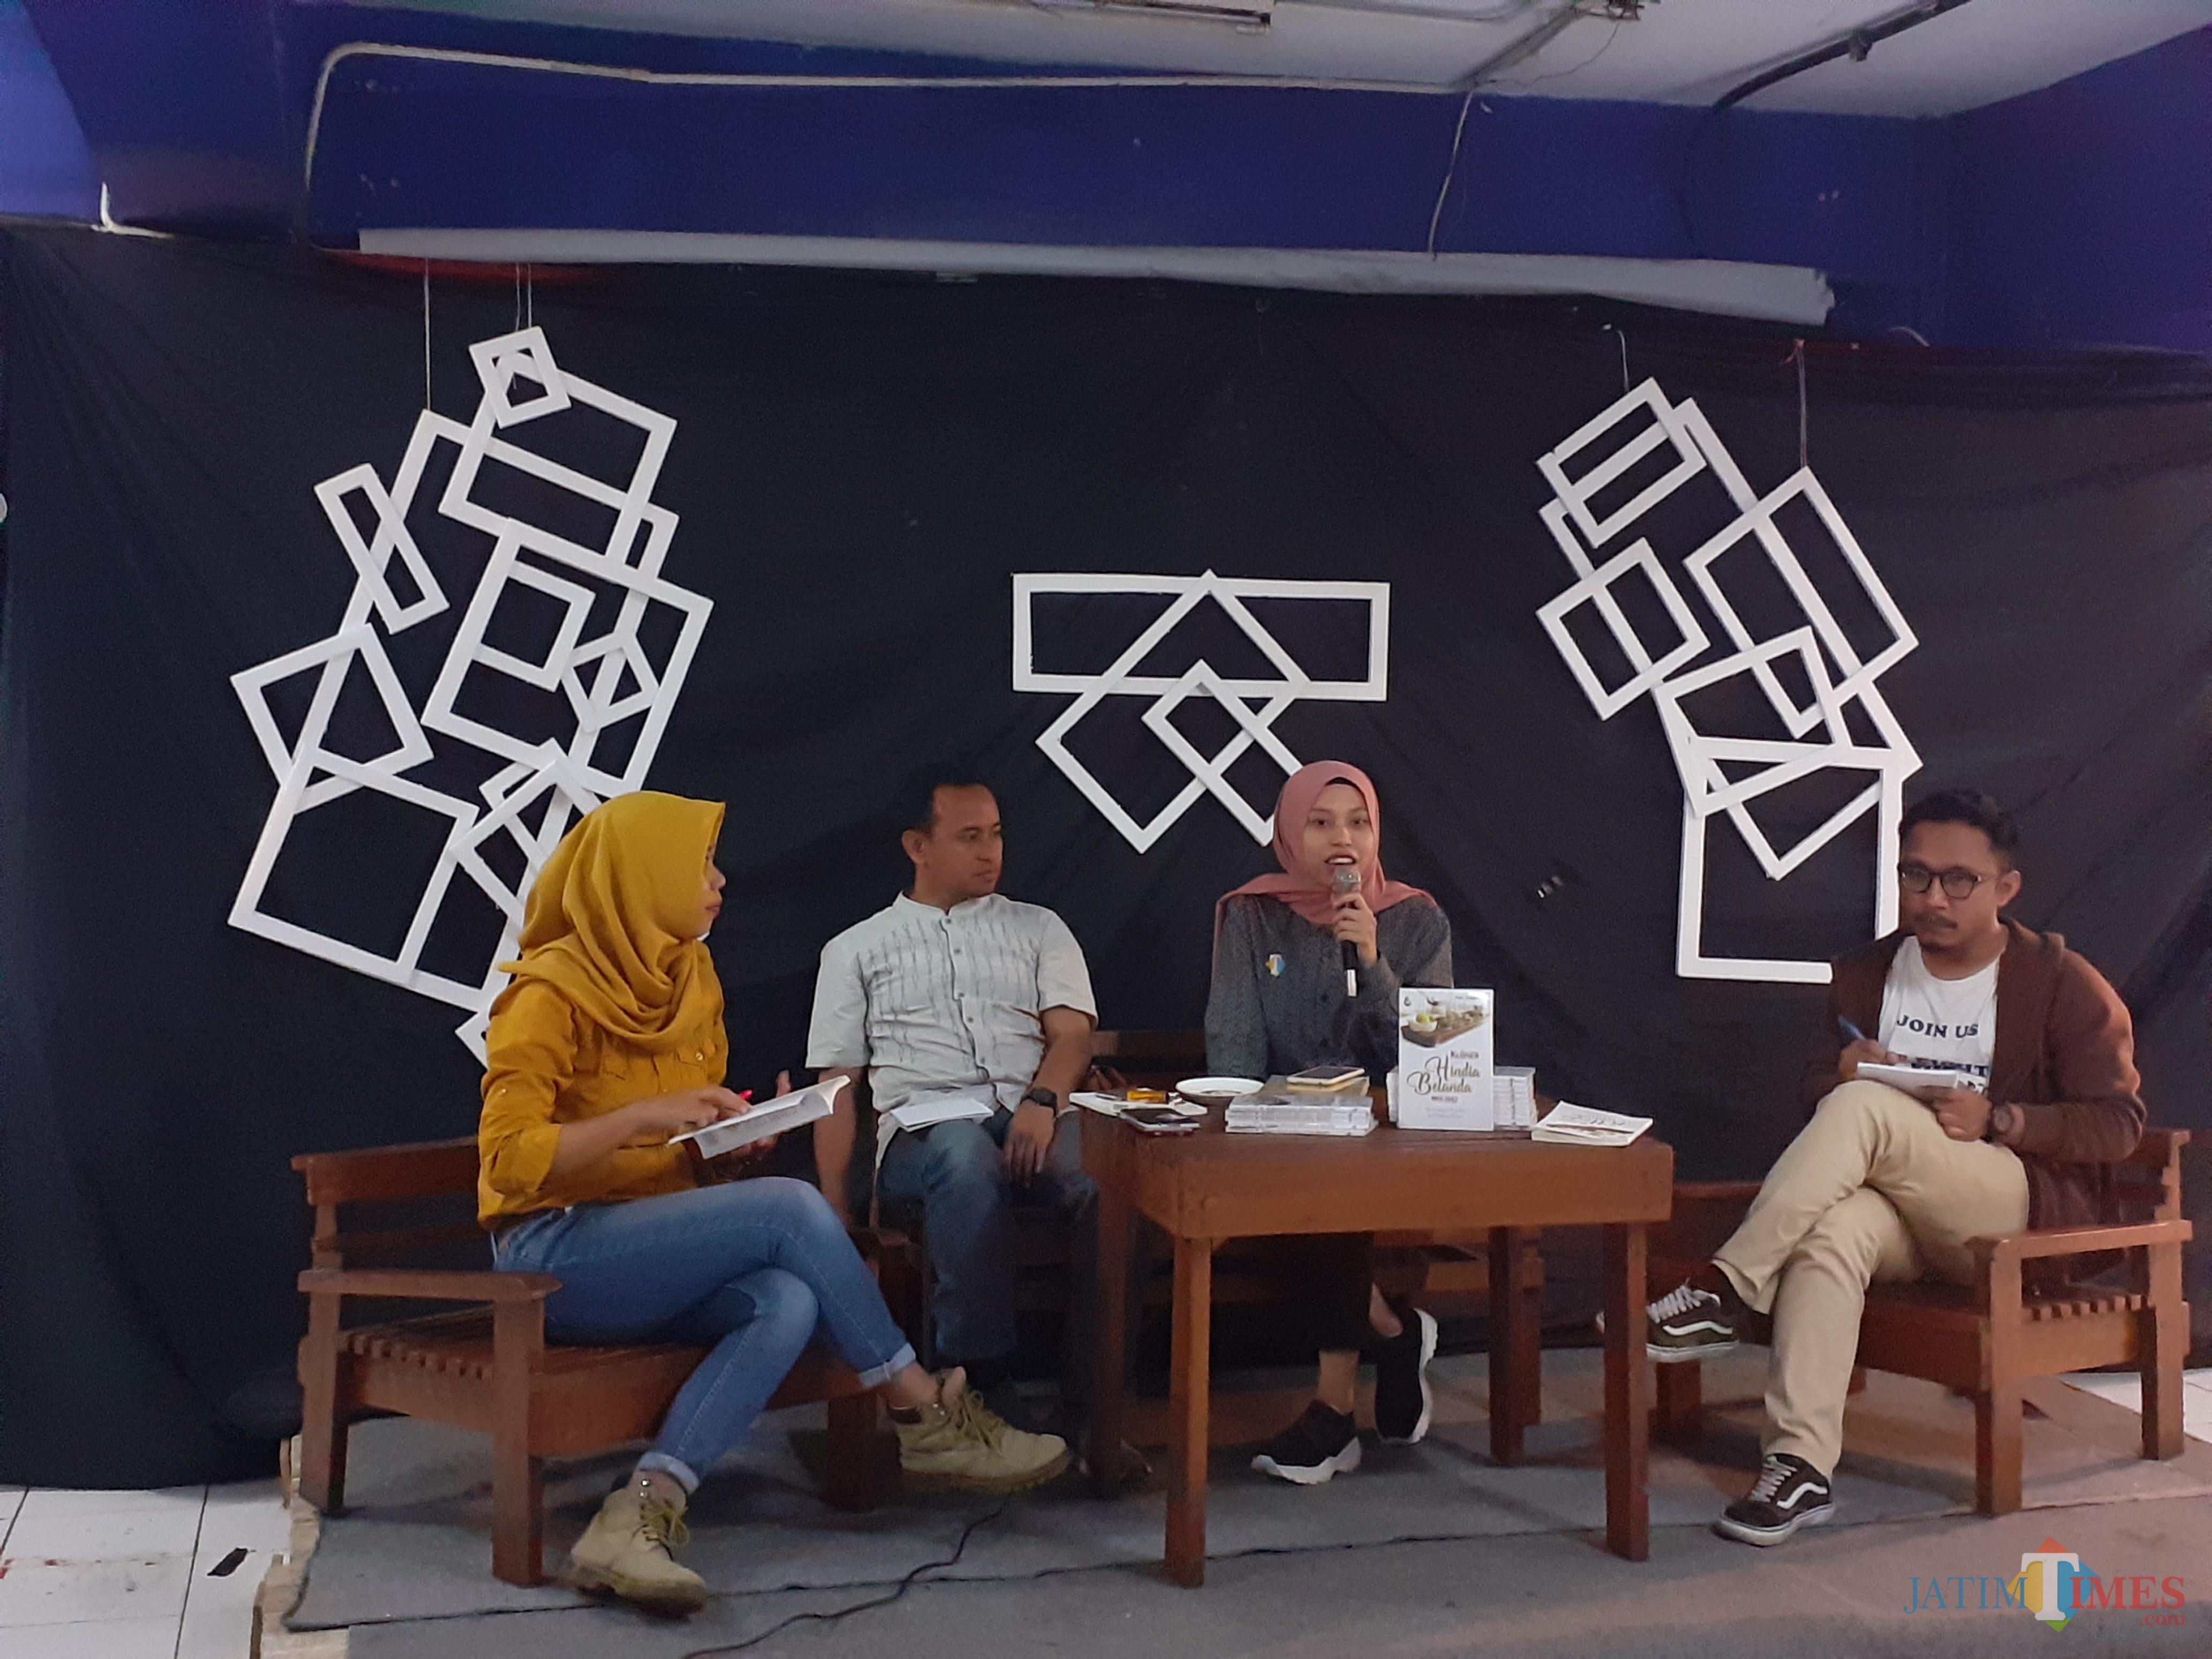 Suasana bedah buku kuliner Hindia-Belanda karya Pipit Anggraeni di Coffee Times, Selasa (29/10) malam. (Arifina Cahyanti Firdausi/MalangTIMES)